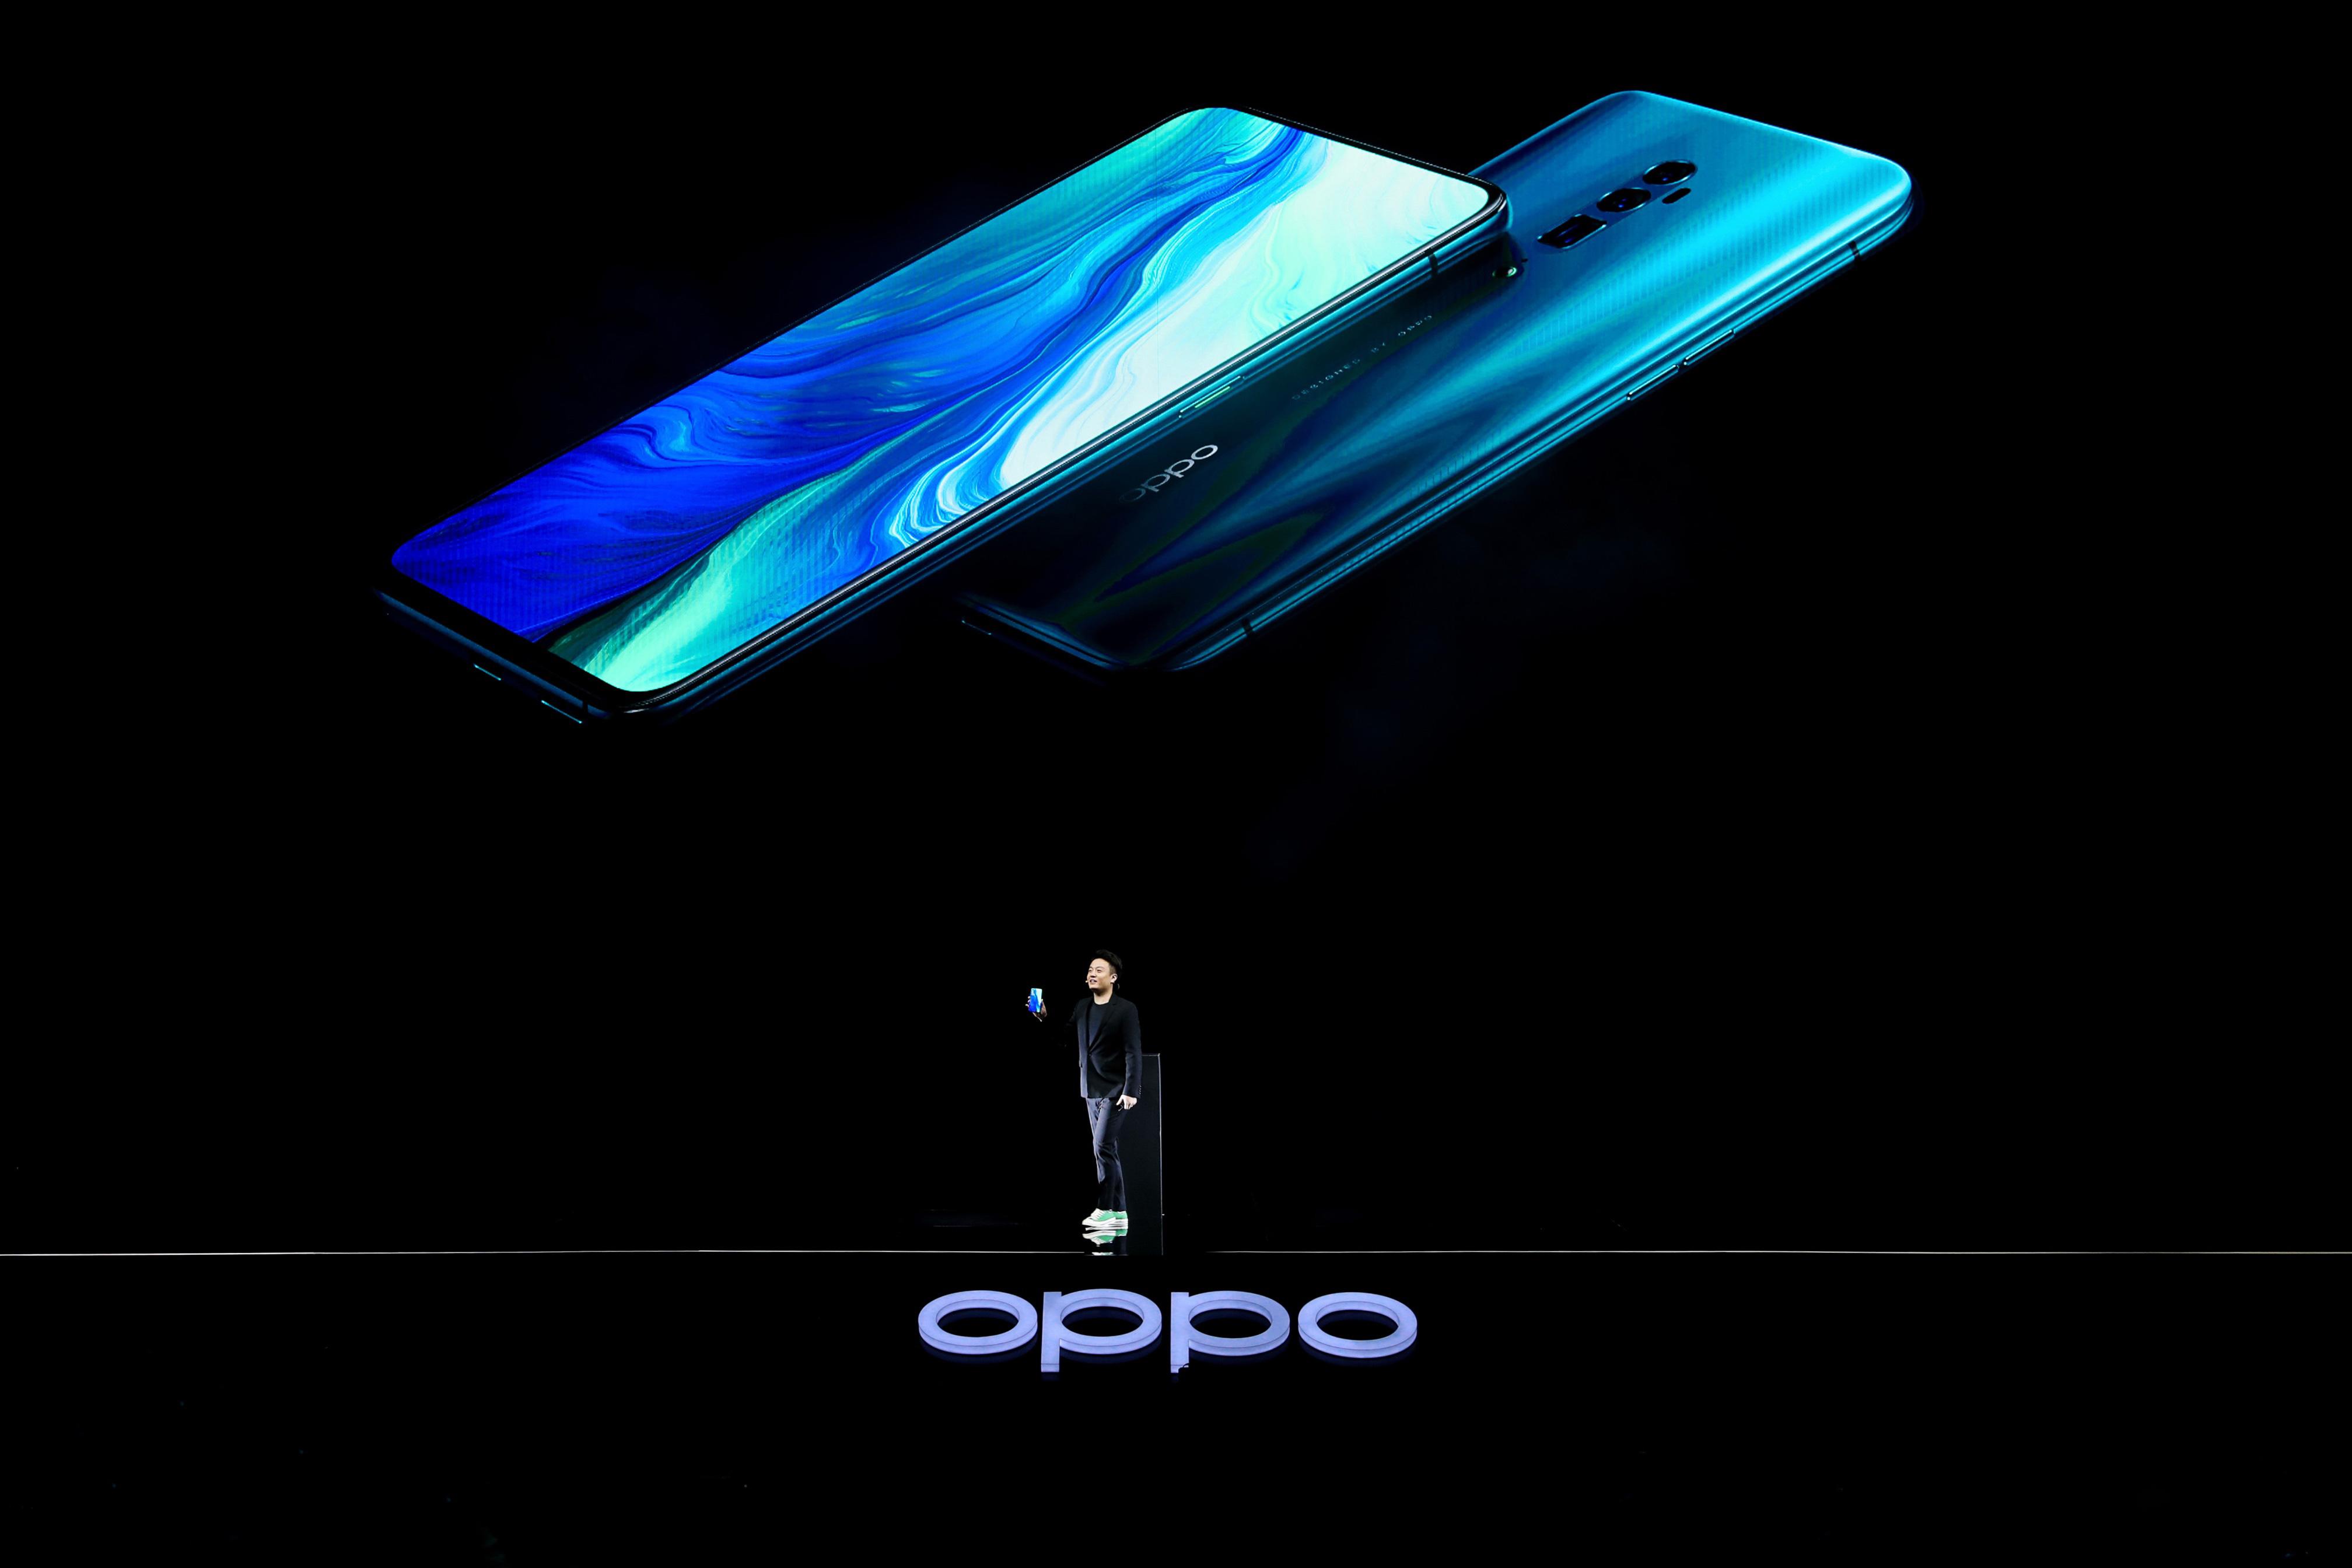 OPPO Reno系列正式發表 讓每個人成為創造者